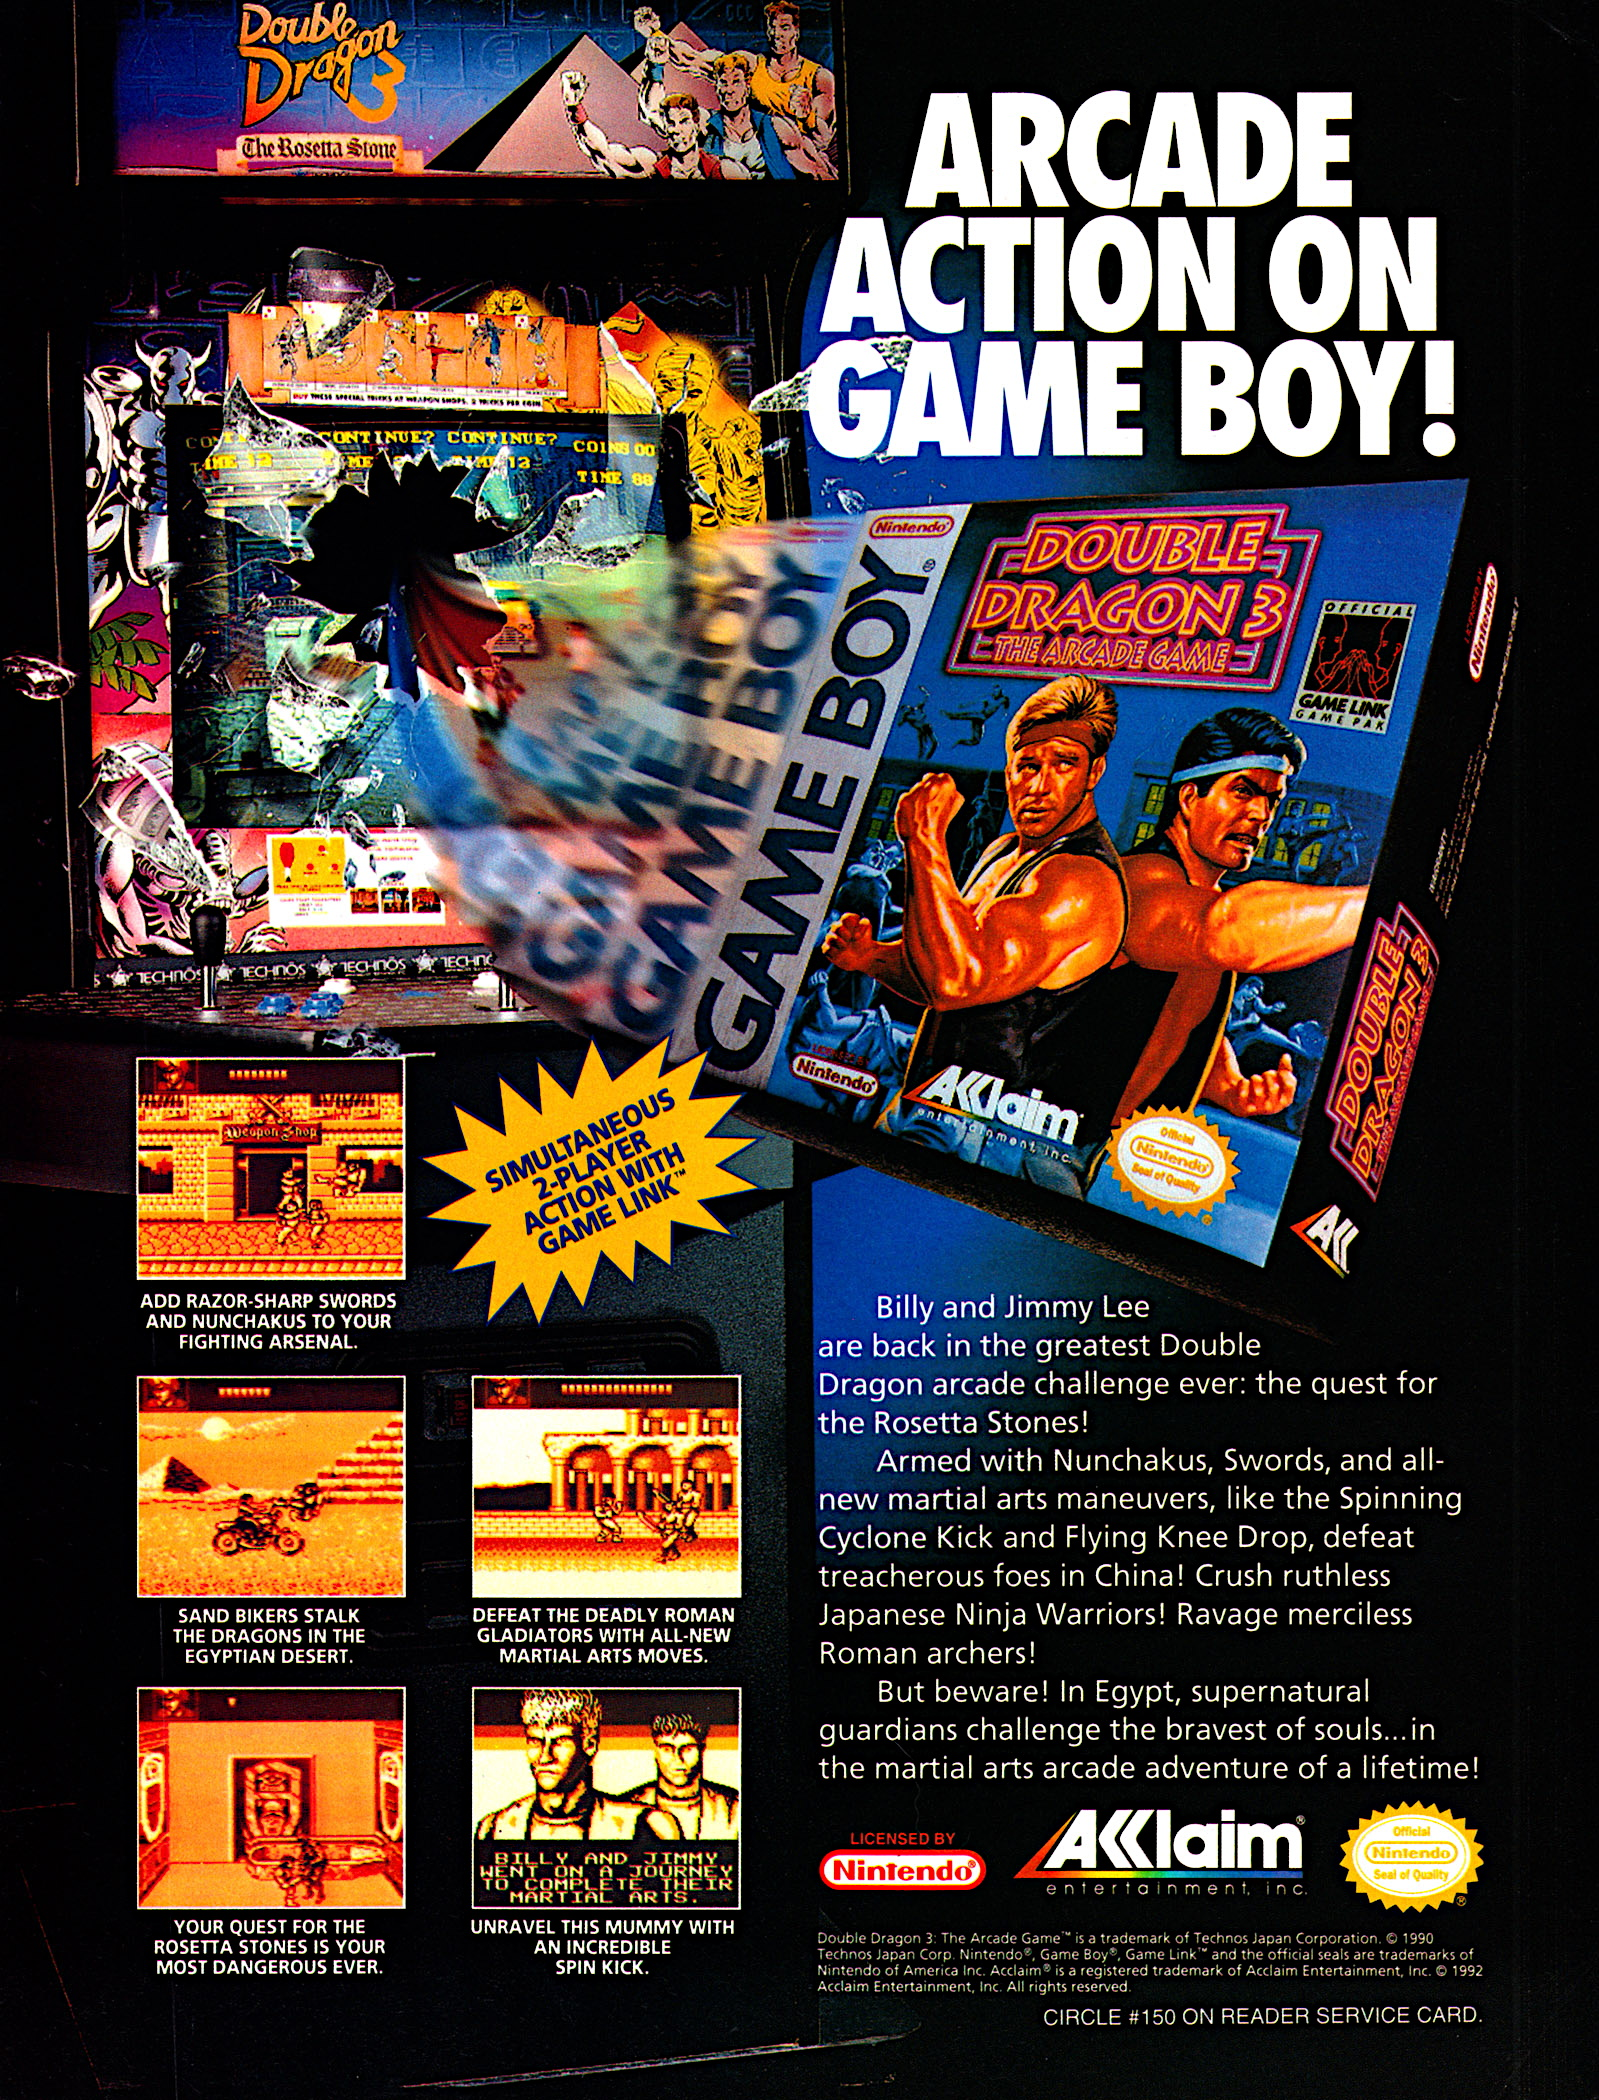 Double dragon arcade download